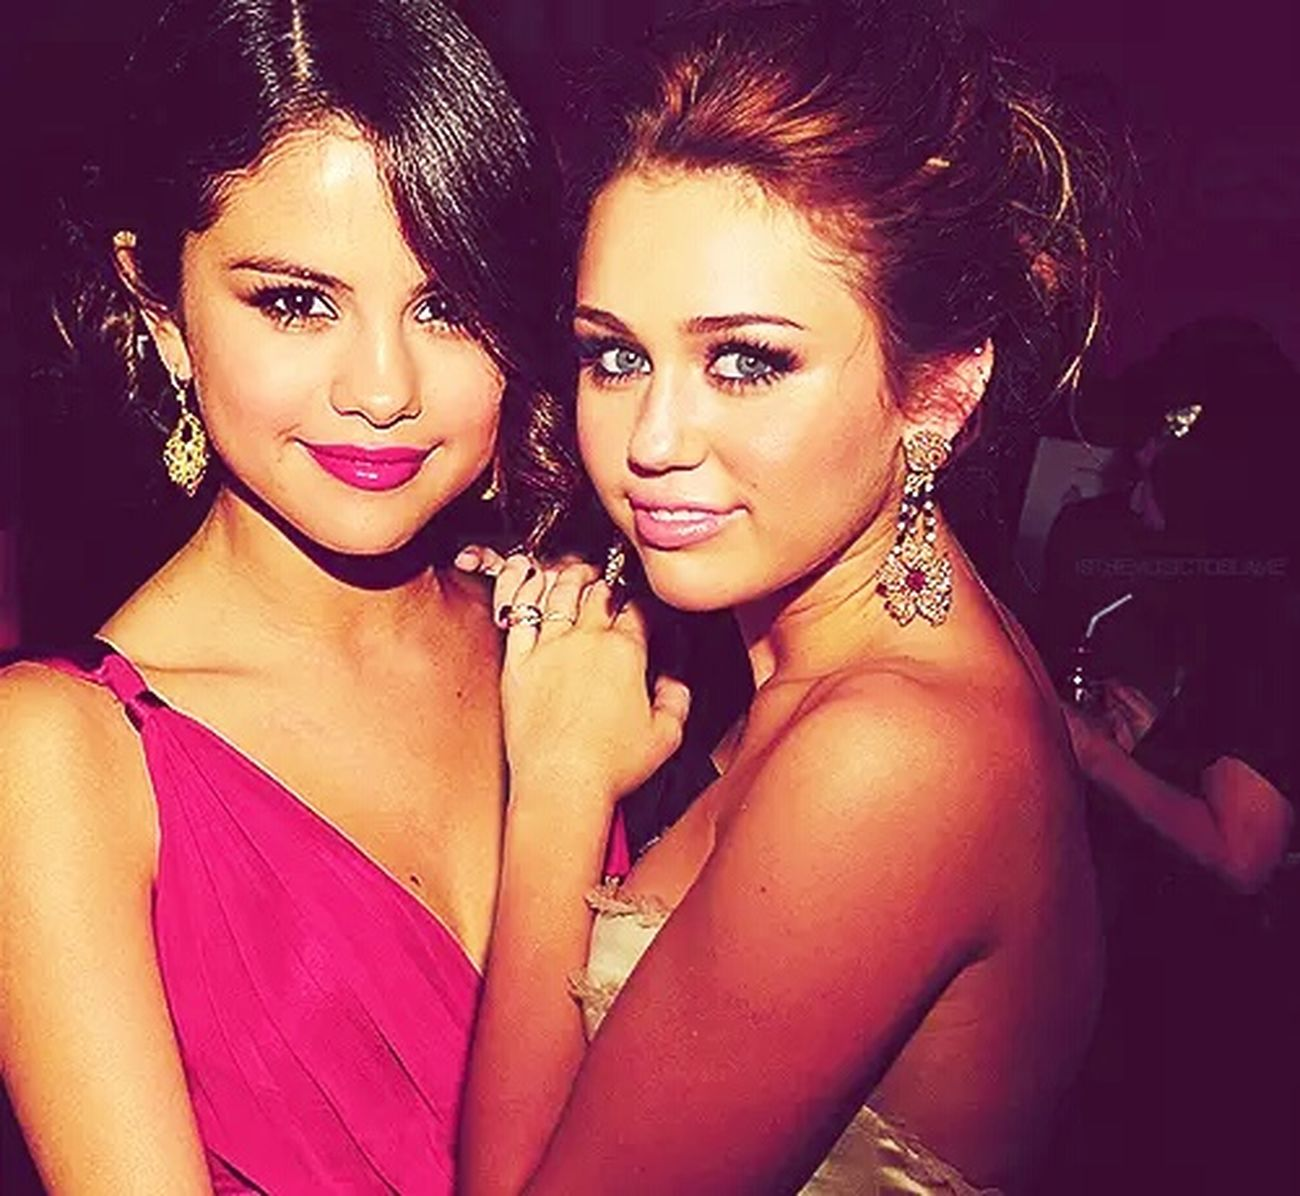 Selena Gomez  Mileycyrus Friends Nosequemasescribir Jajajaja Tipico.